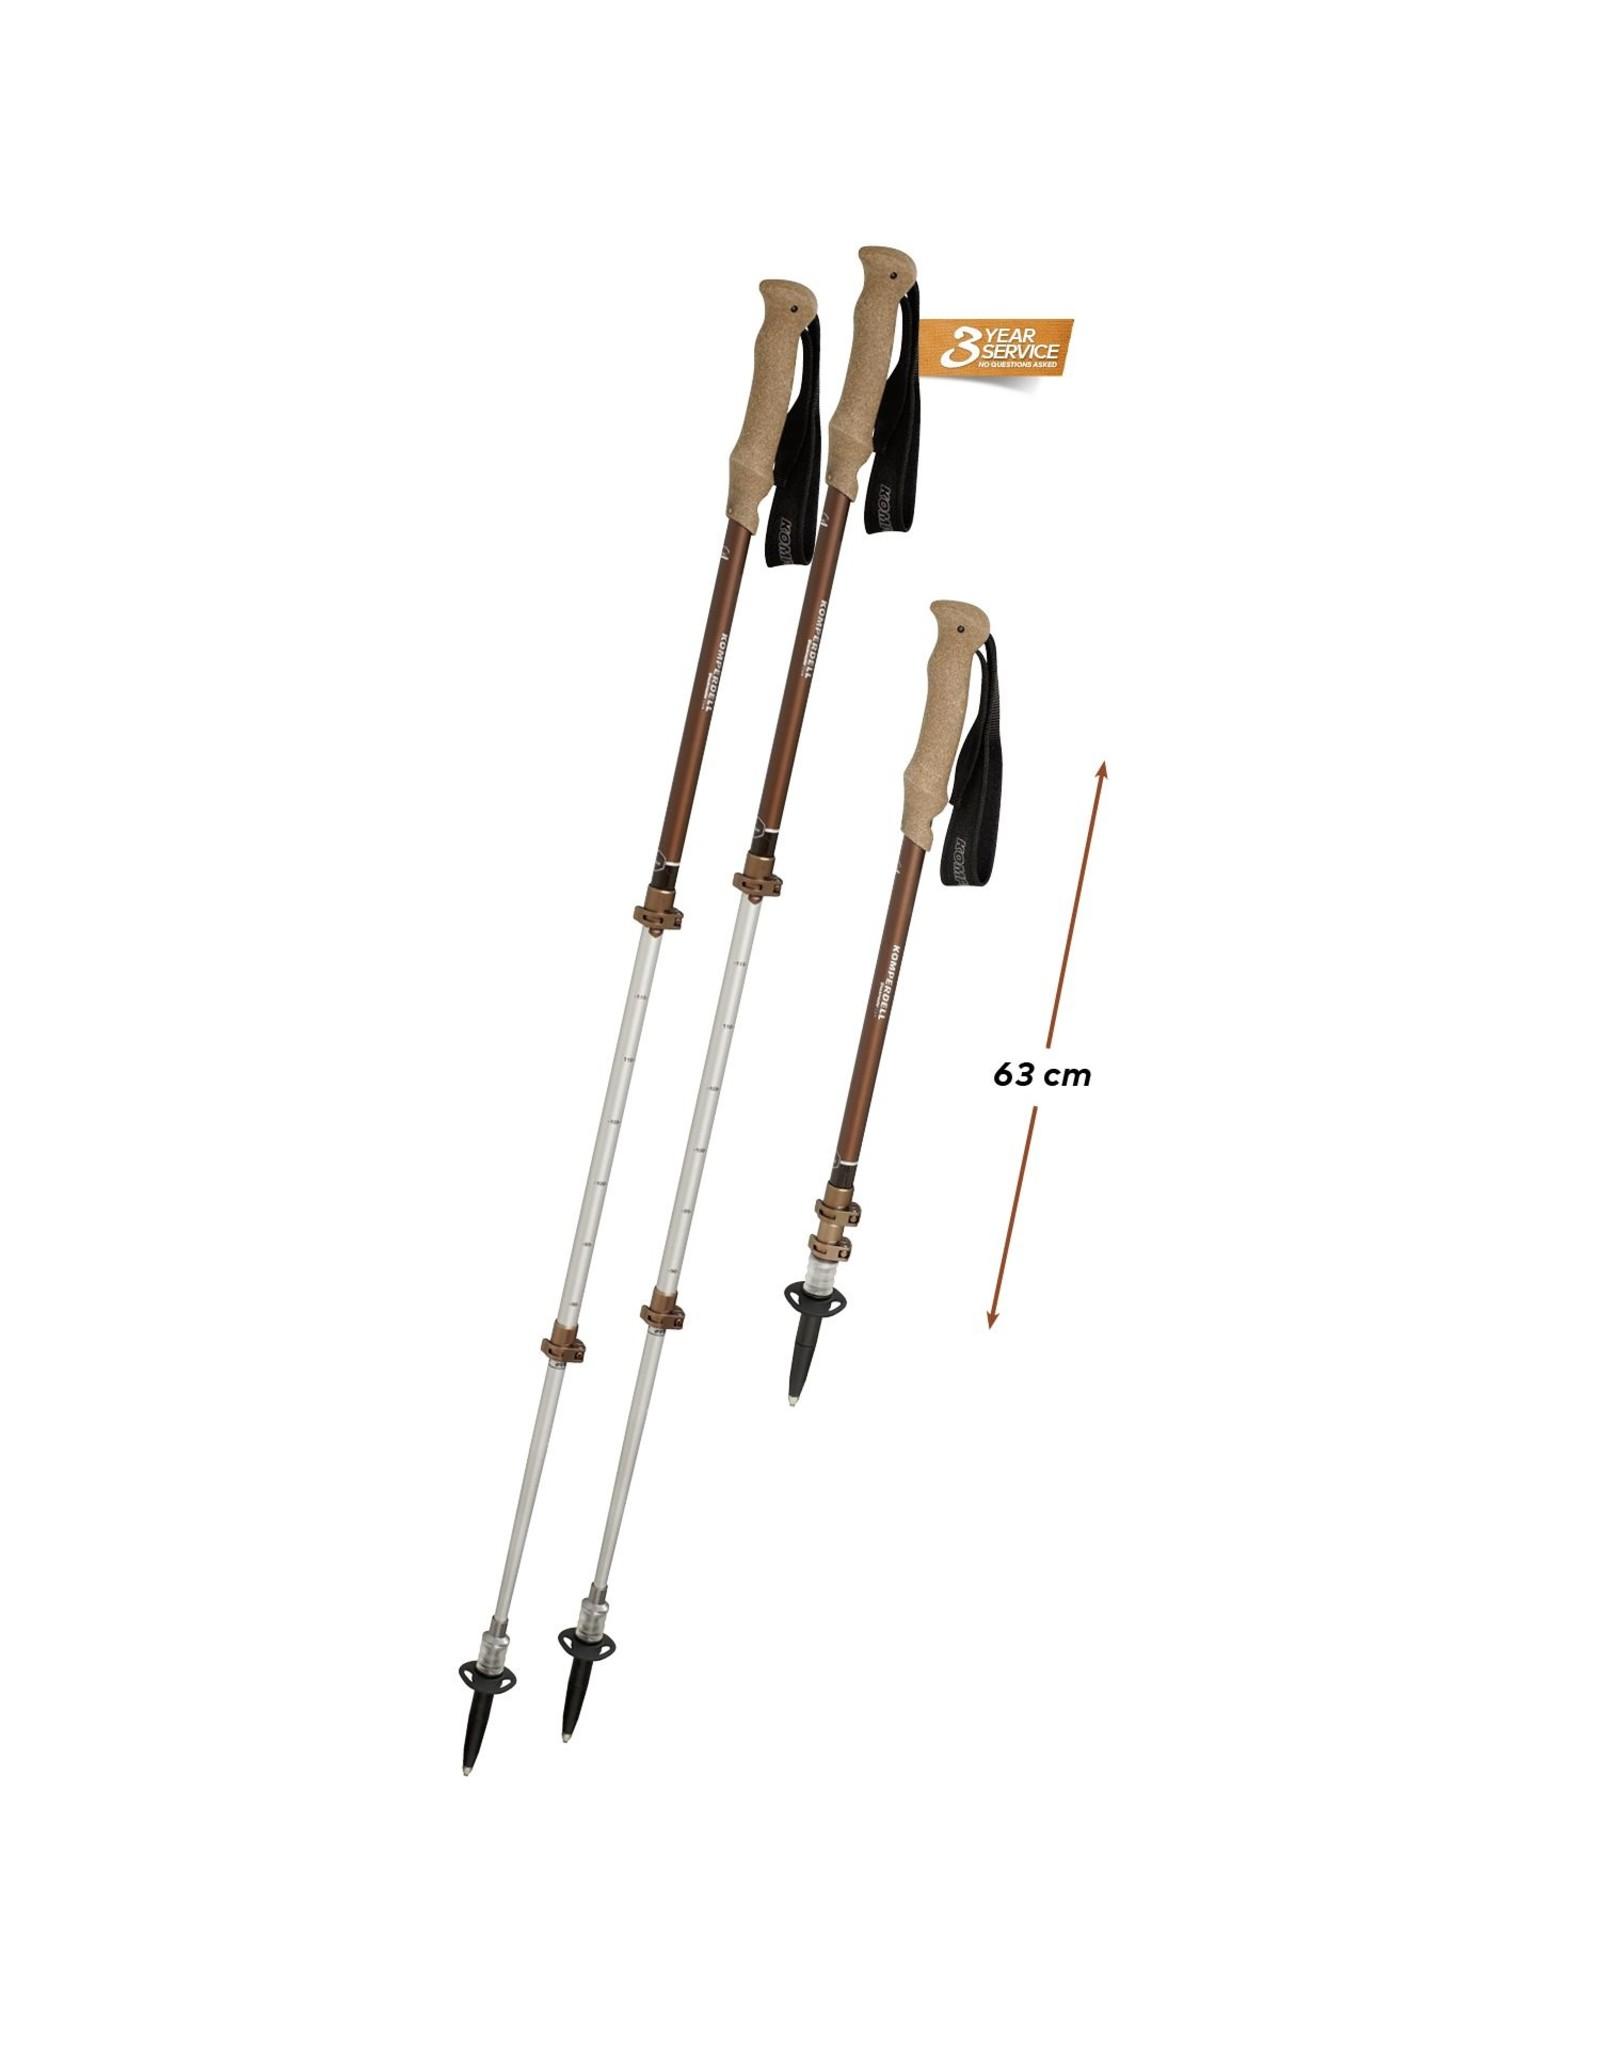 Komperdell Komperdell Shockmaster Cork Compact Trekking Poles